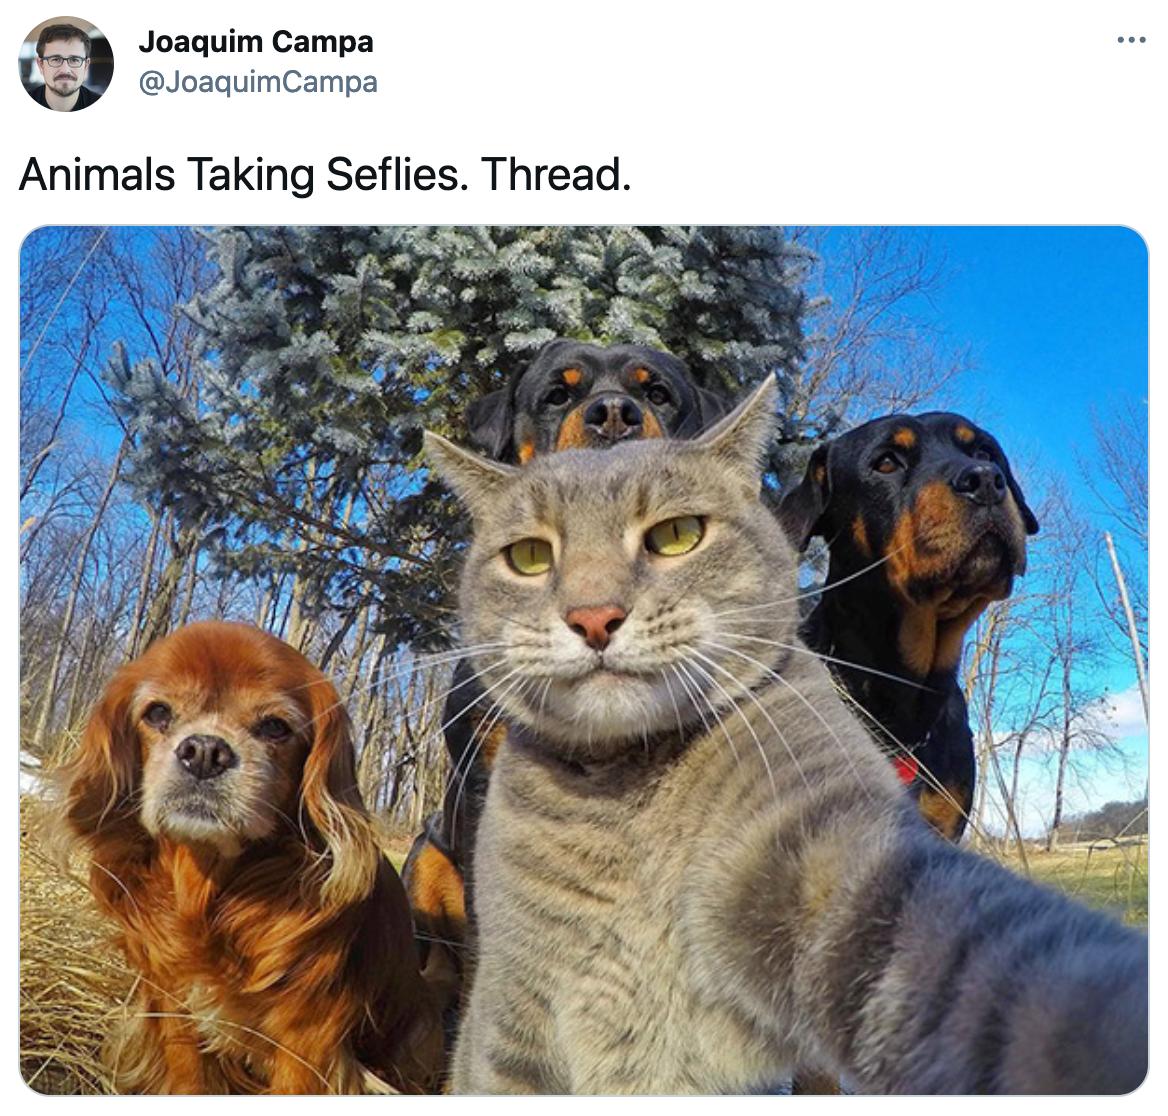 Badass animal selfie on Twitter